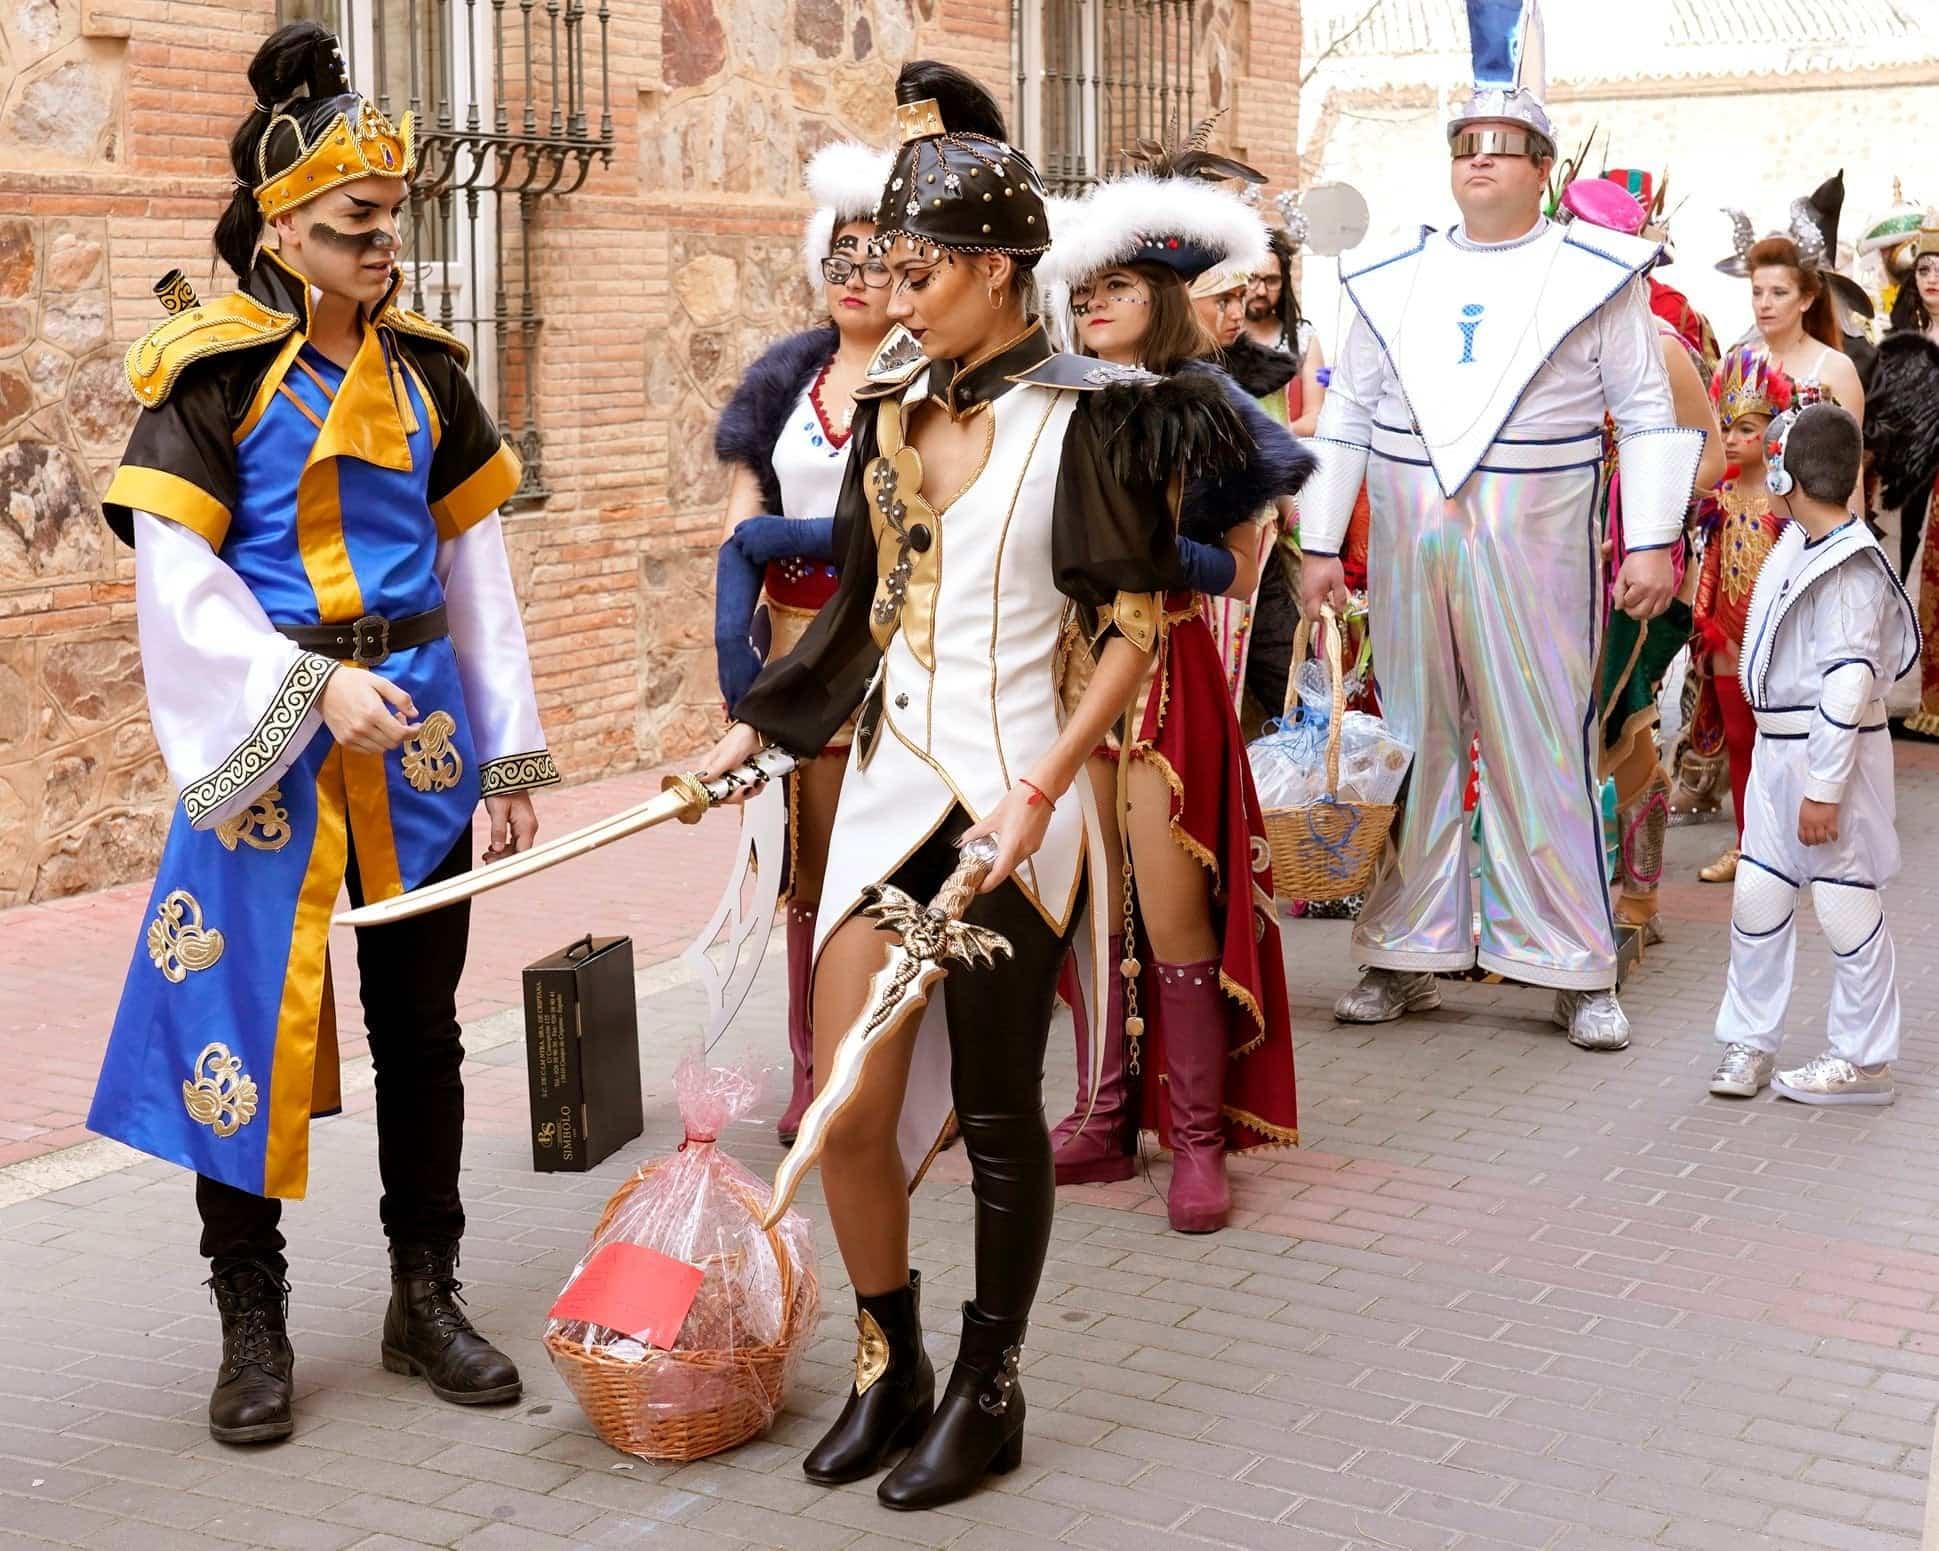 Carnaval de herencia 2020 ofertorio 128 - Selección de fotografías del Ofertorio del Carnaval de Herencia